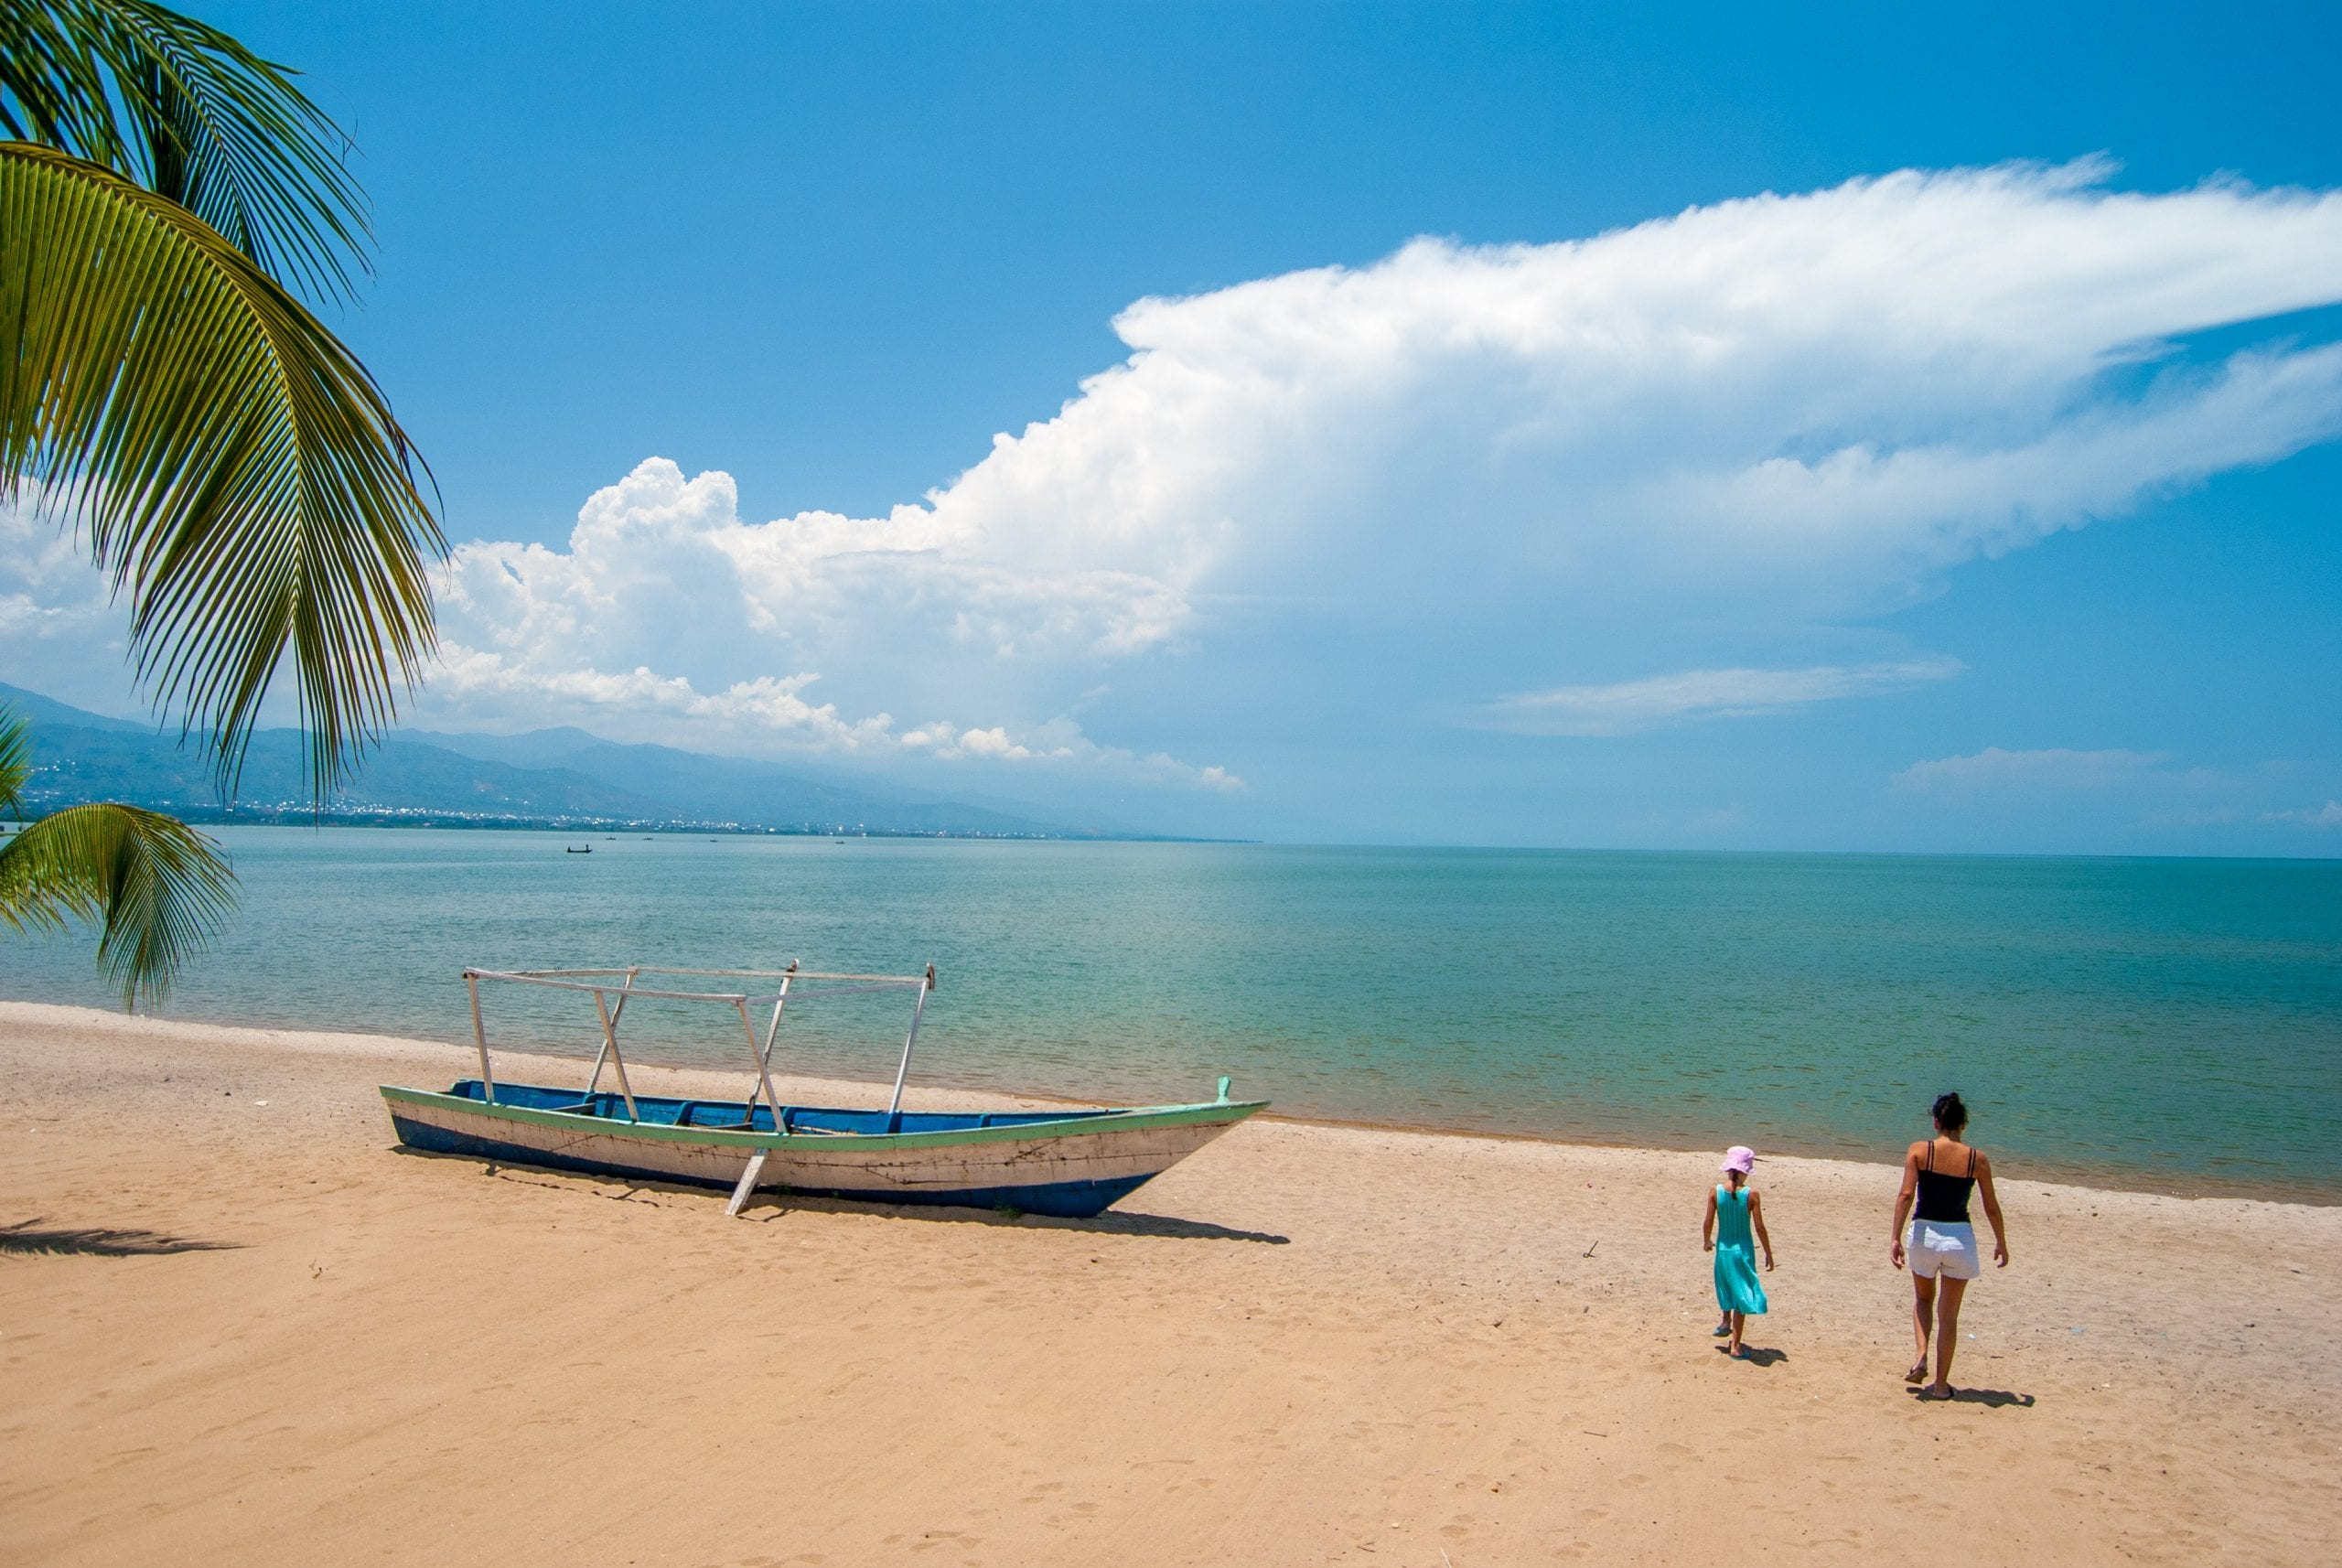 top things to do in Bujumbura: Lake Tanganyika